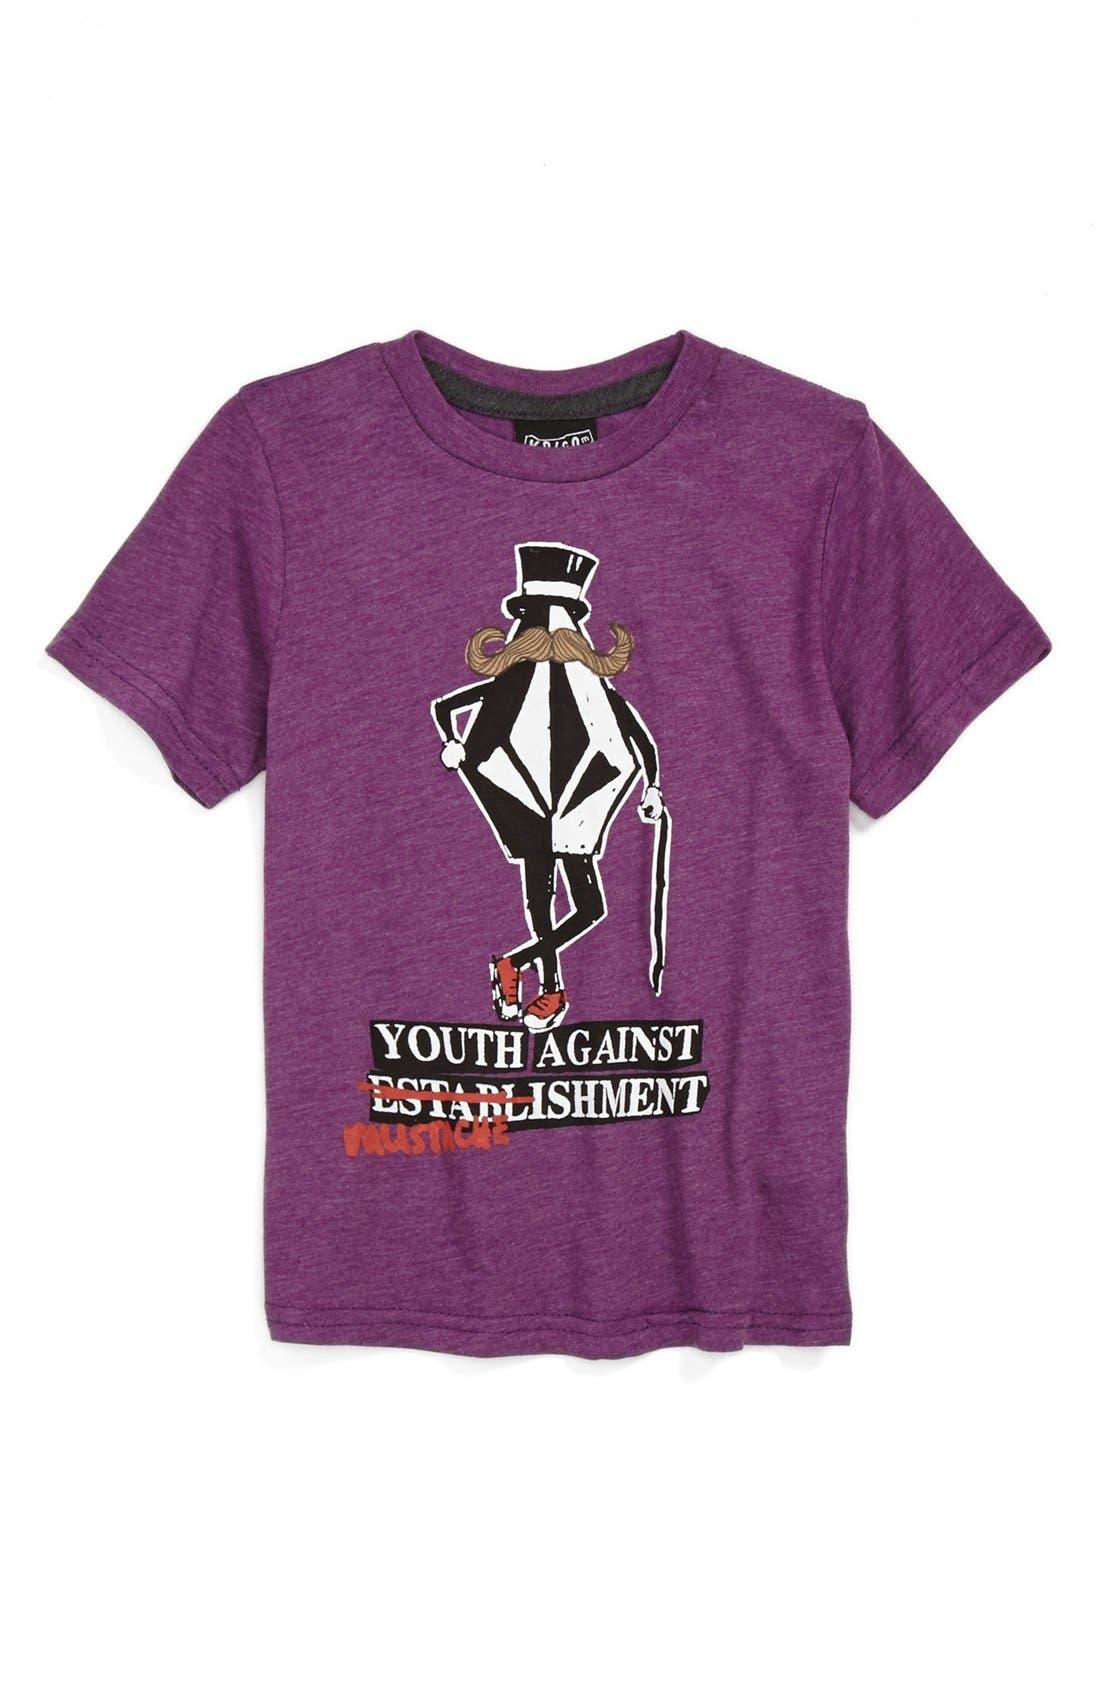 Alternate Image 1 Selected - Volcom 'Mustablishment' Graphic T-Shirt (Little Boys)